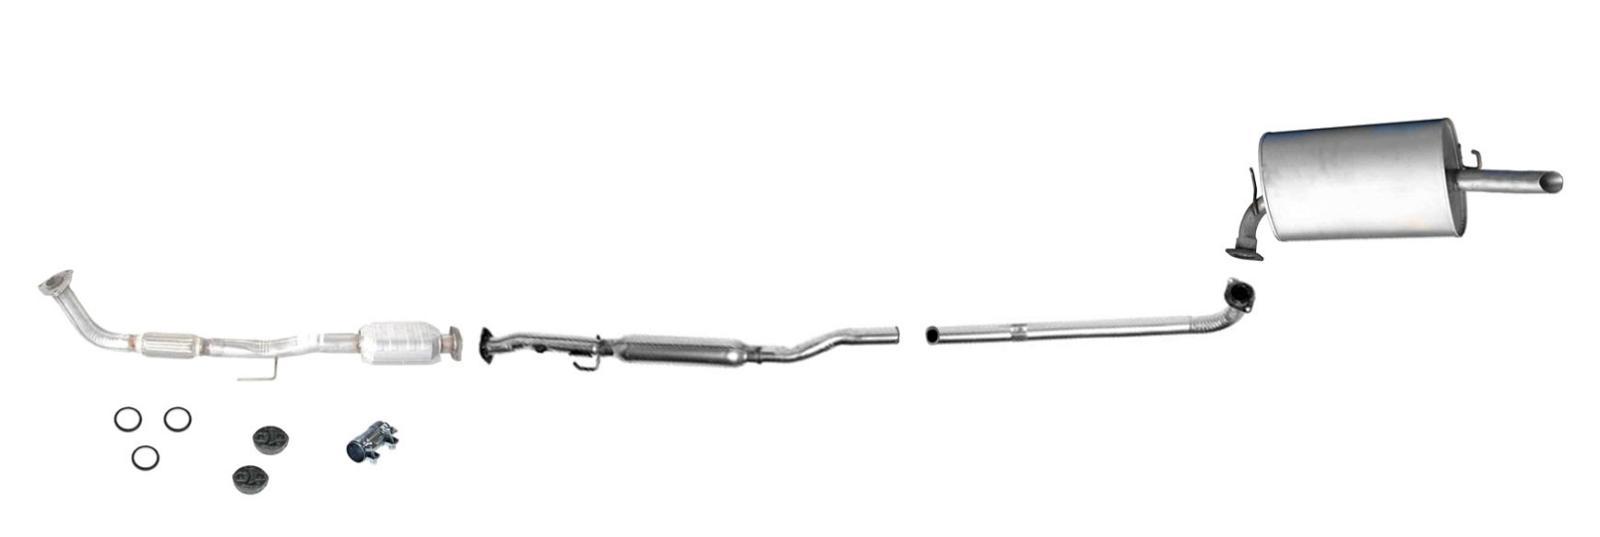 Toyota Rav4 Floor Mats 97-99 Camry 2.2 Converter Muffler Pipe Exhaust System With Federal ...